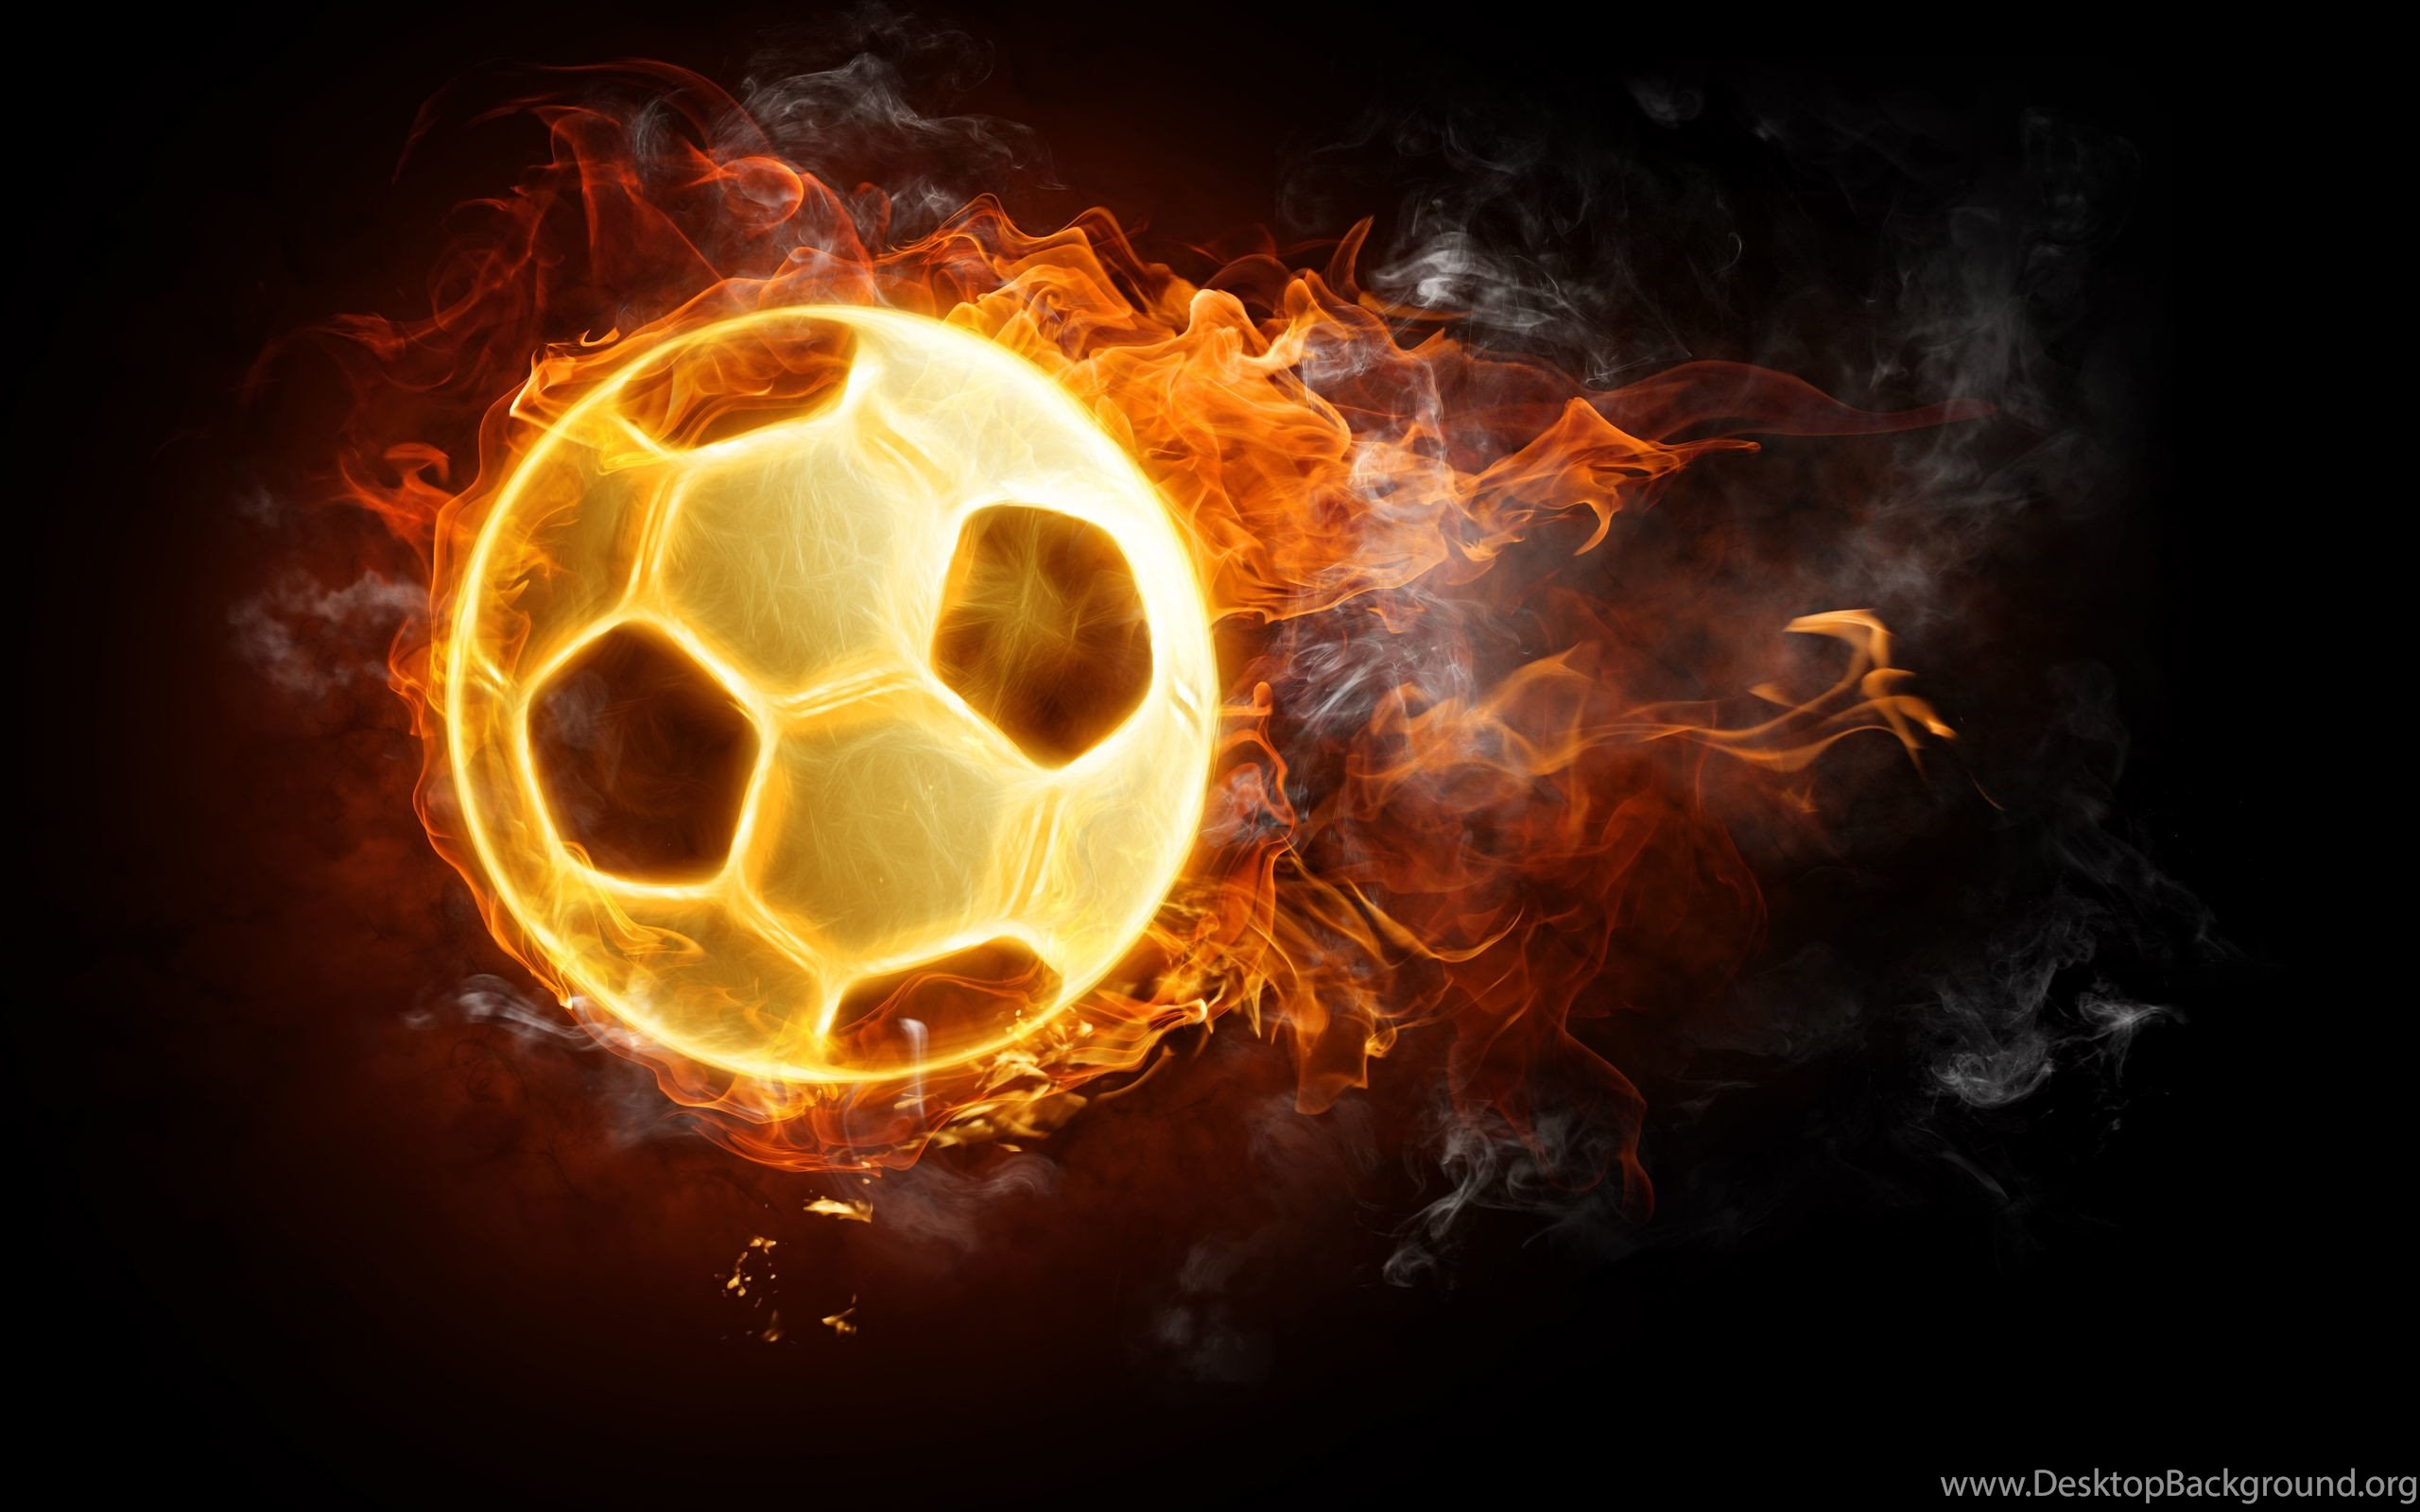 Soccer ball wallpapers elegant 6502 full hd wallpapers desktop res original size 3113kb voltagebd Choice Image